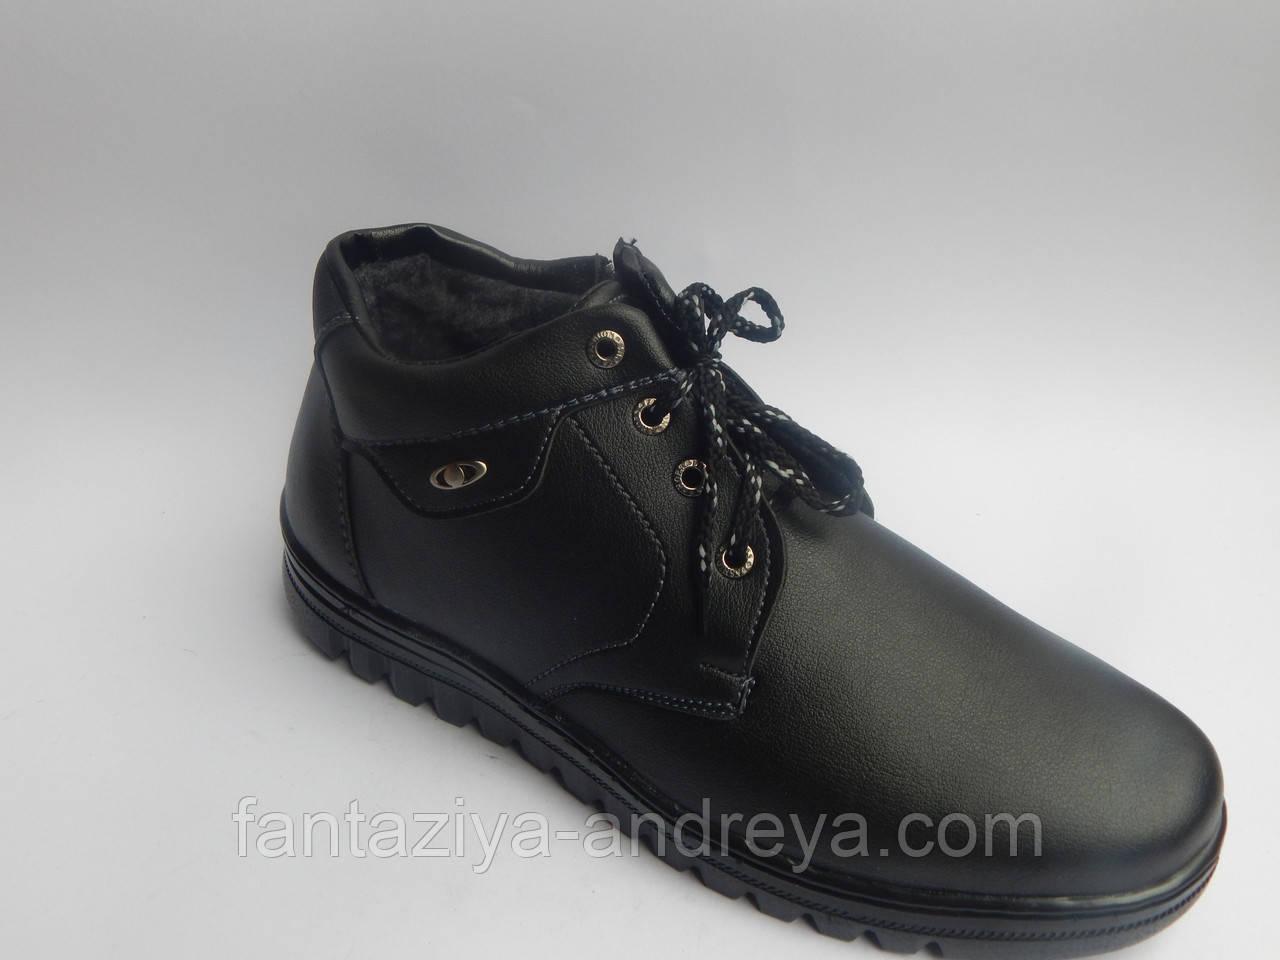 39525134f Зимние теплые ботинки для мужчин КАРДИНАЛ В-2 - Интернет-магазин